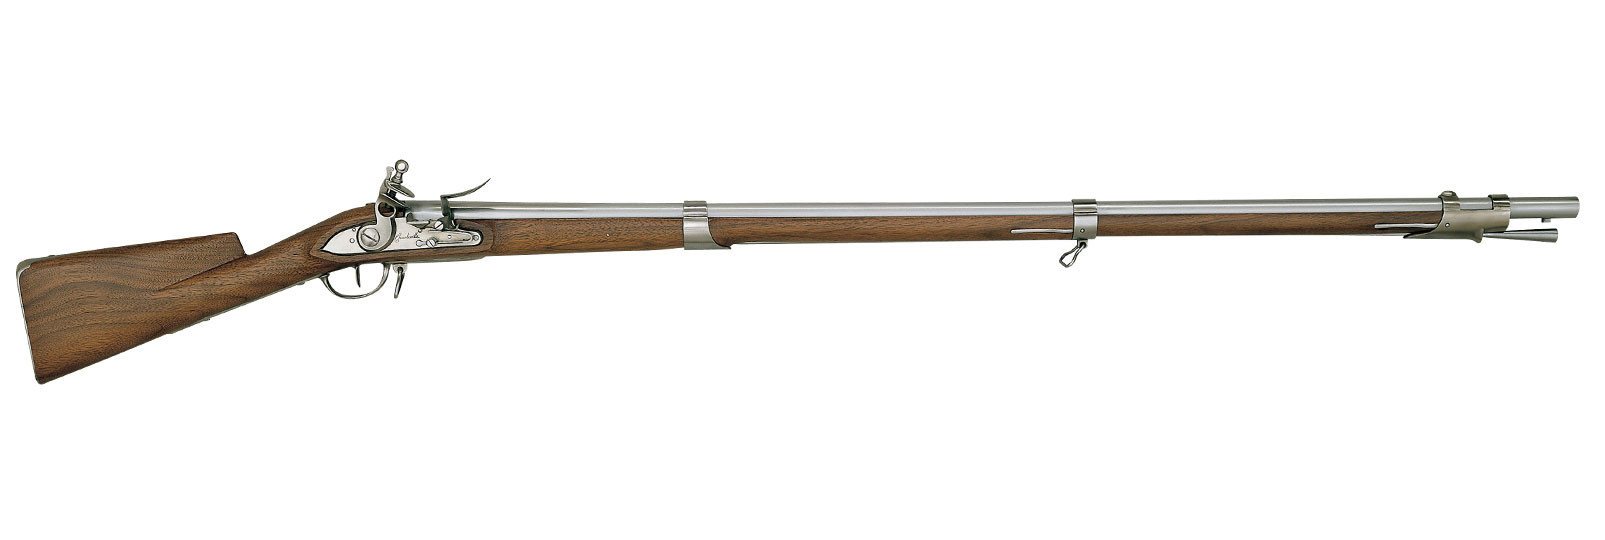 1763 Leger (1766)...